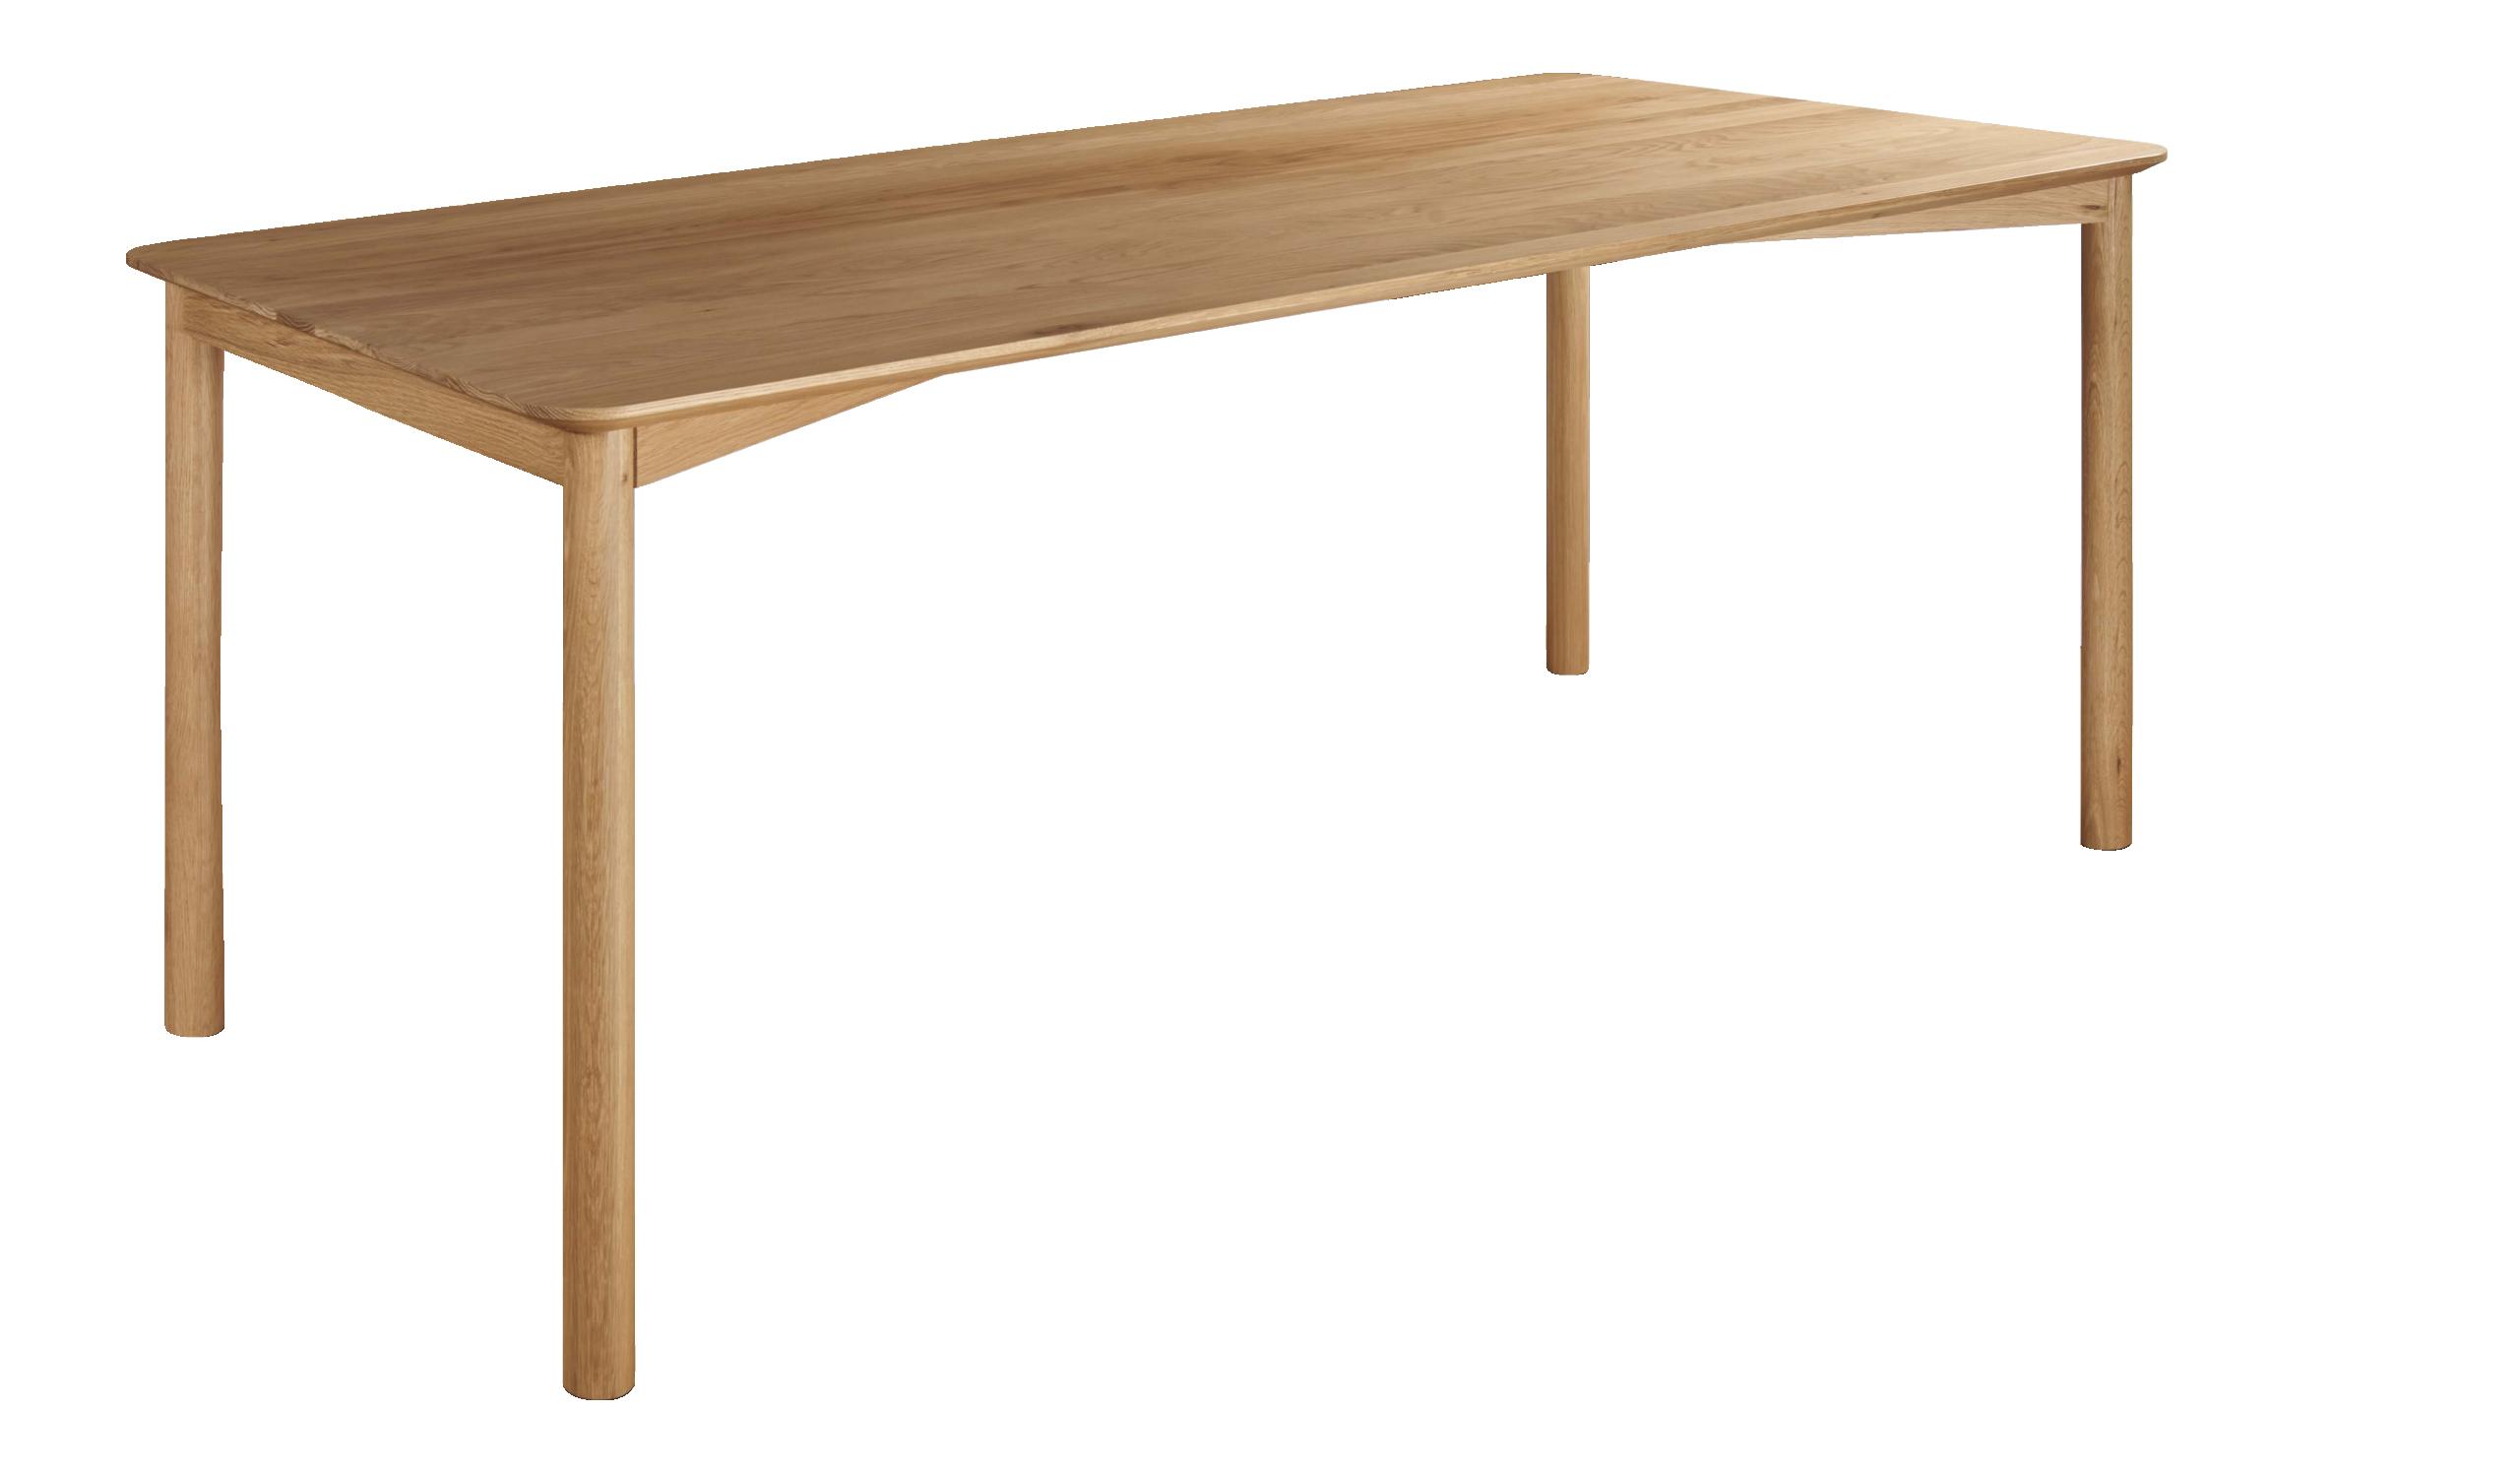 19+ Table salle a manger habitat ideas